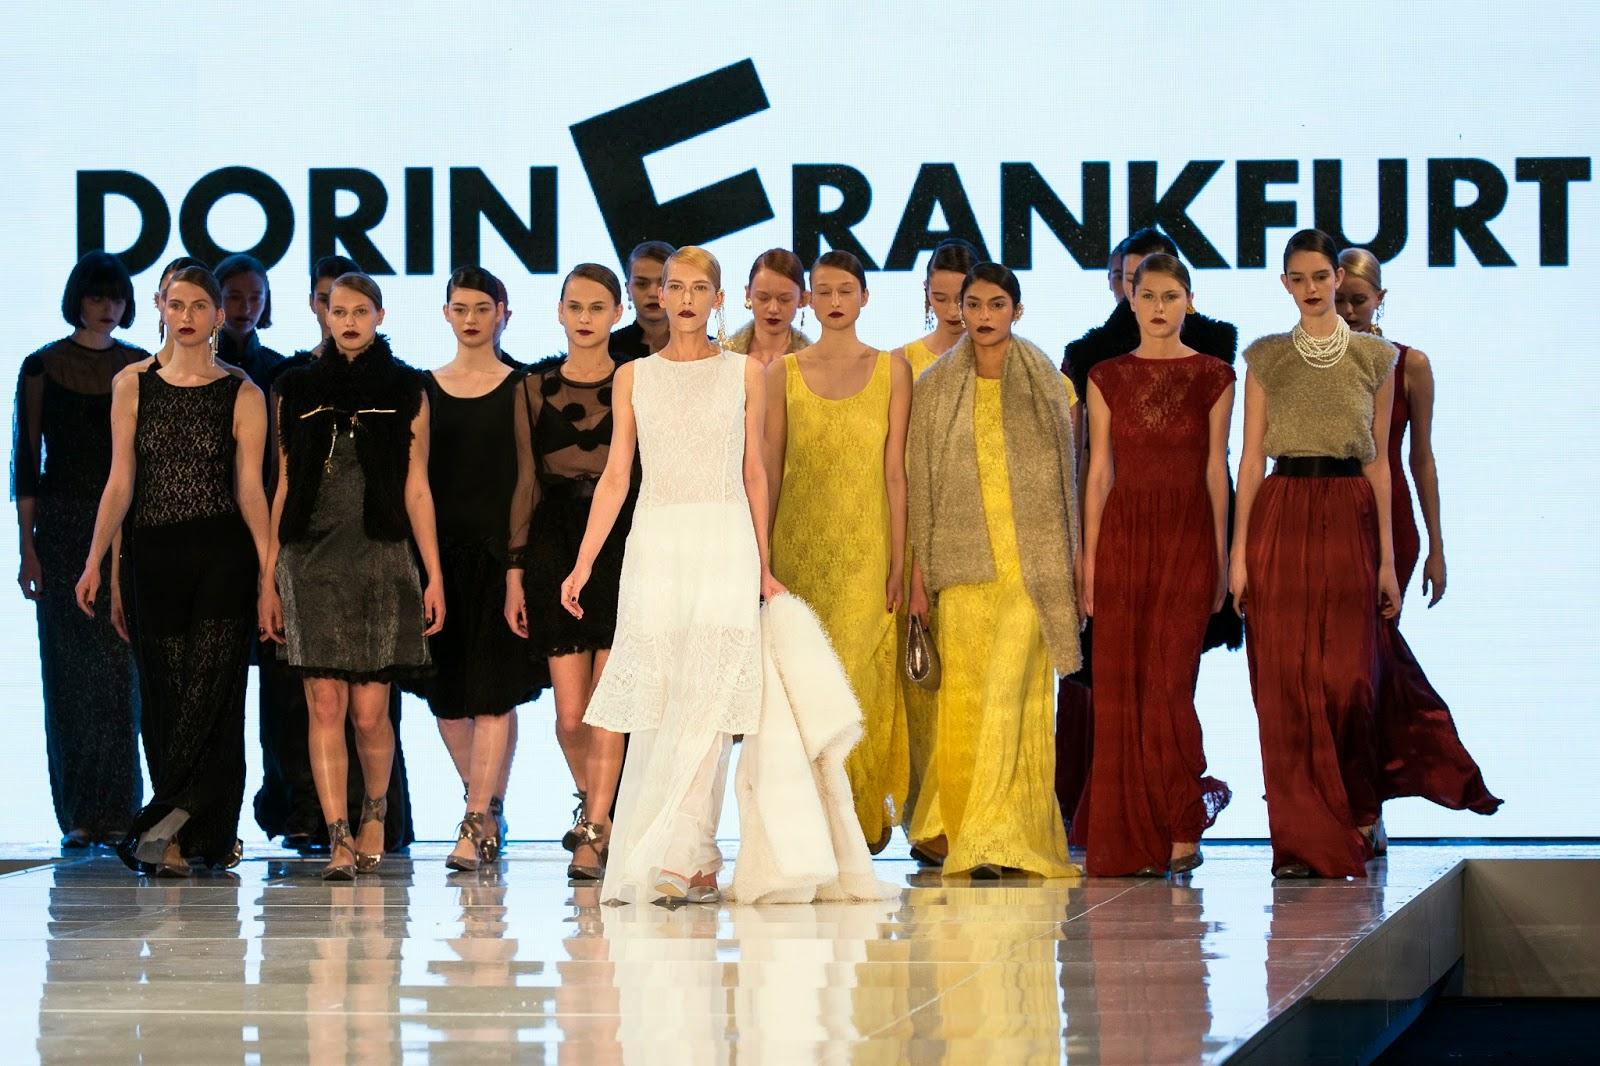 City, Coastal, Collections, Creation, Designer, Dorin Frankfurt, Fashion, Fashion Week, Israeli, Lifestyle, Makeup, Mediterranean Island, Models, Showbiz, Tel Aviv, Tel Aviv Fashion Week,